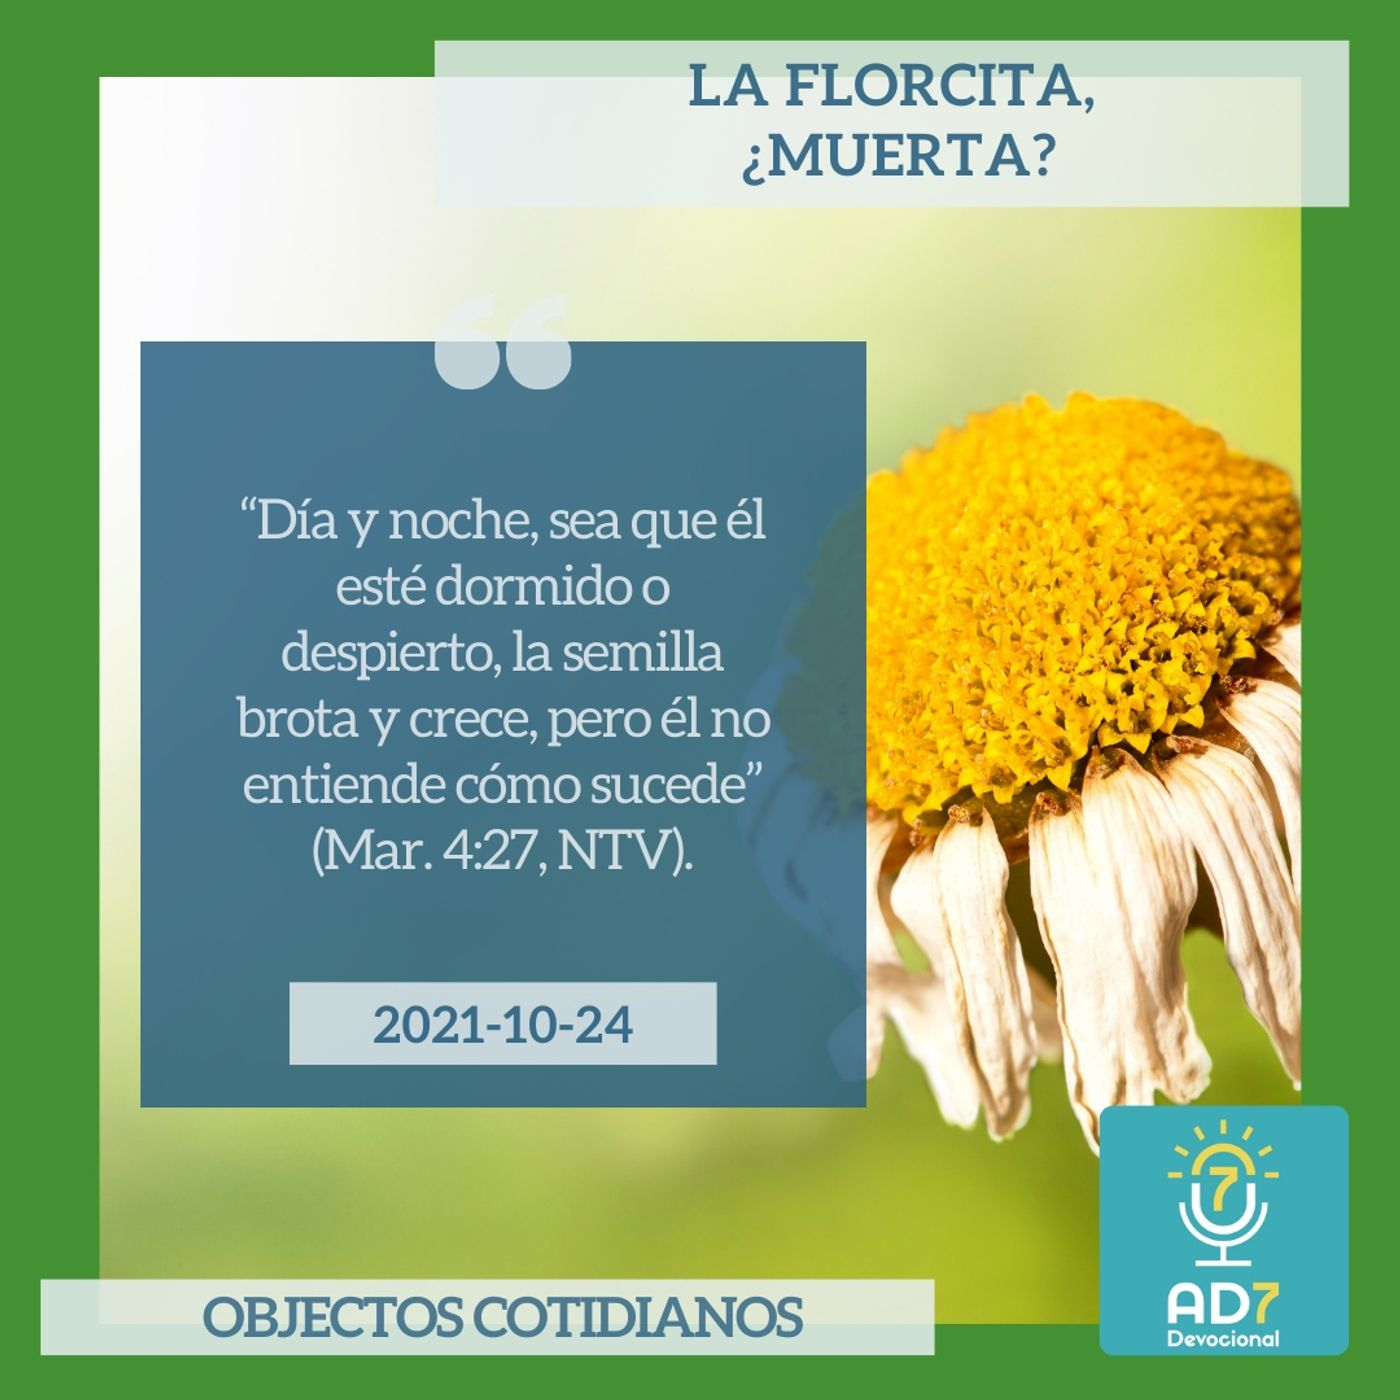 24 de octubre - La florcita, ¿muerta? - Devocional de Jóvenes - Etiquetas Para Reflexionar